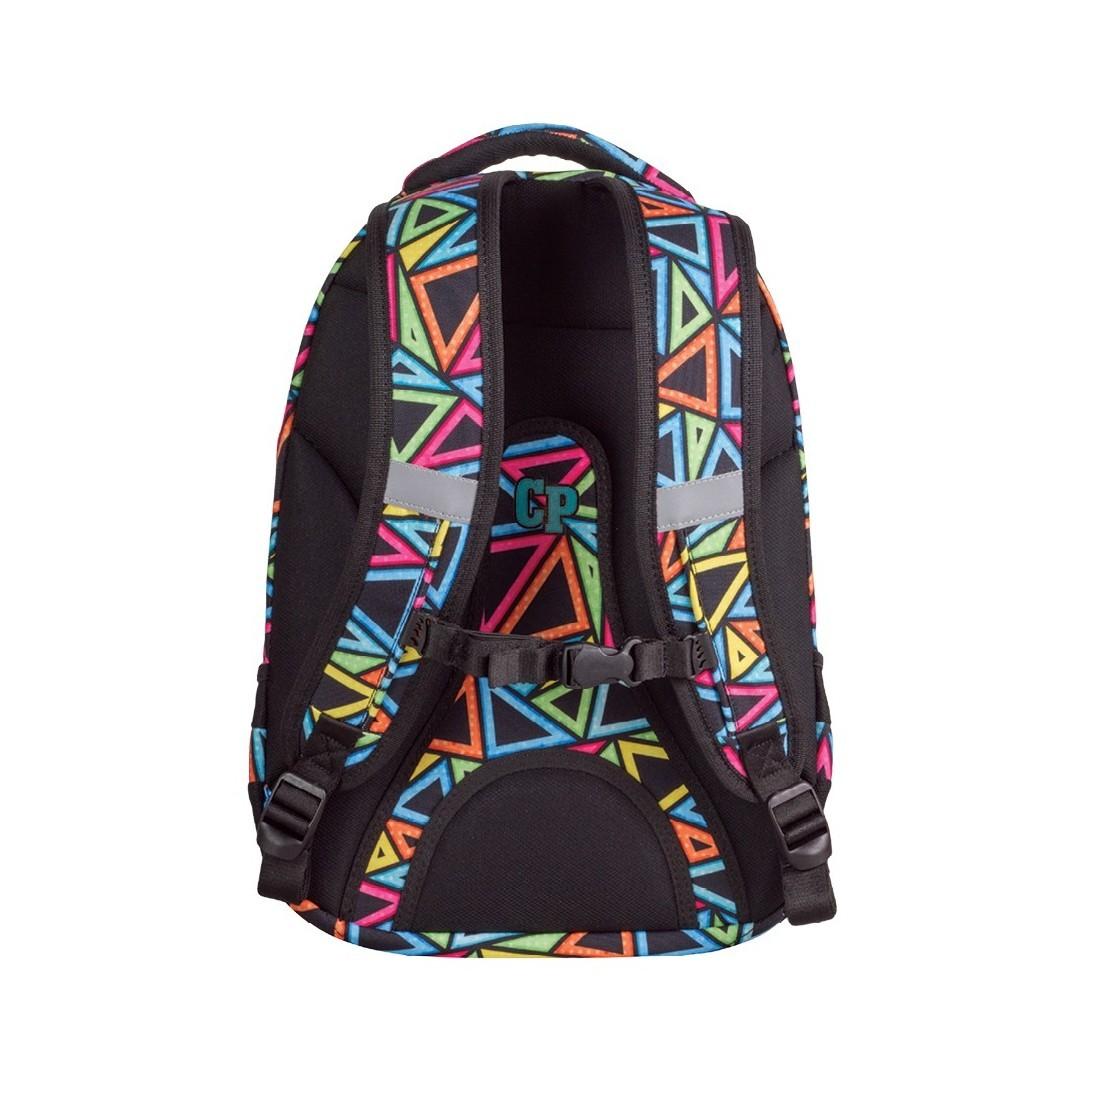 Plecak młodzieżowy CoolPack CP COLLEGE CANDY CHECK kolorowe